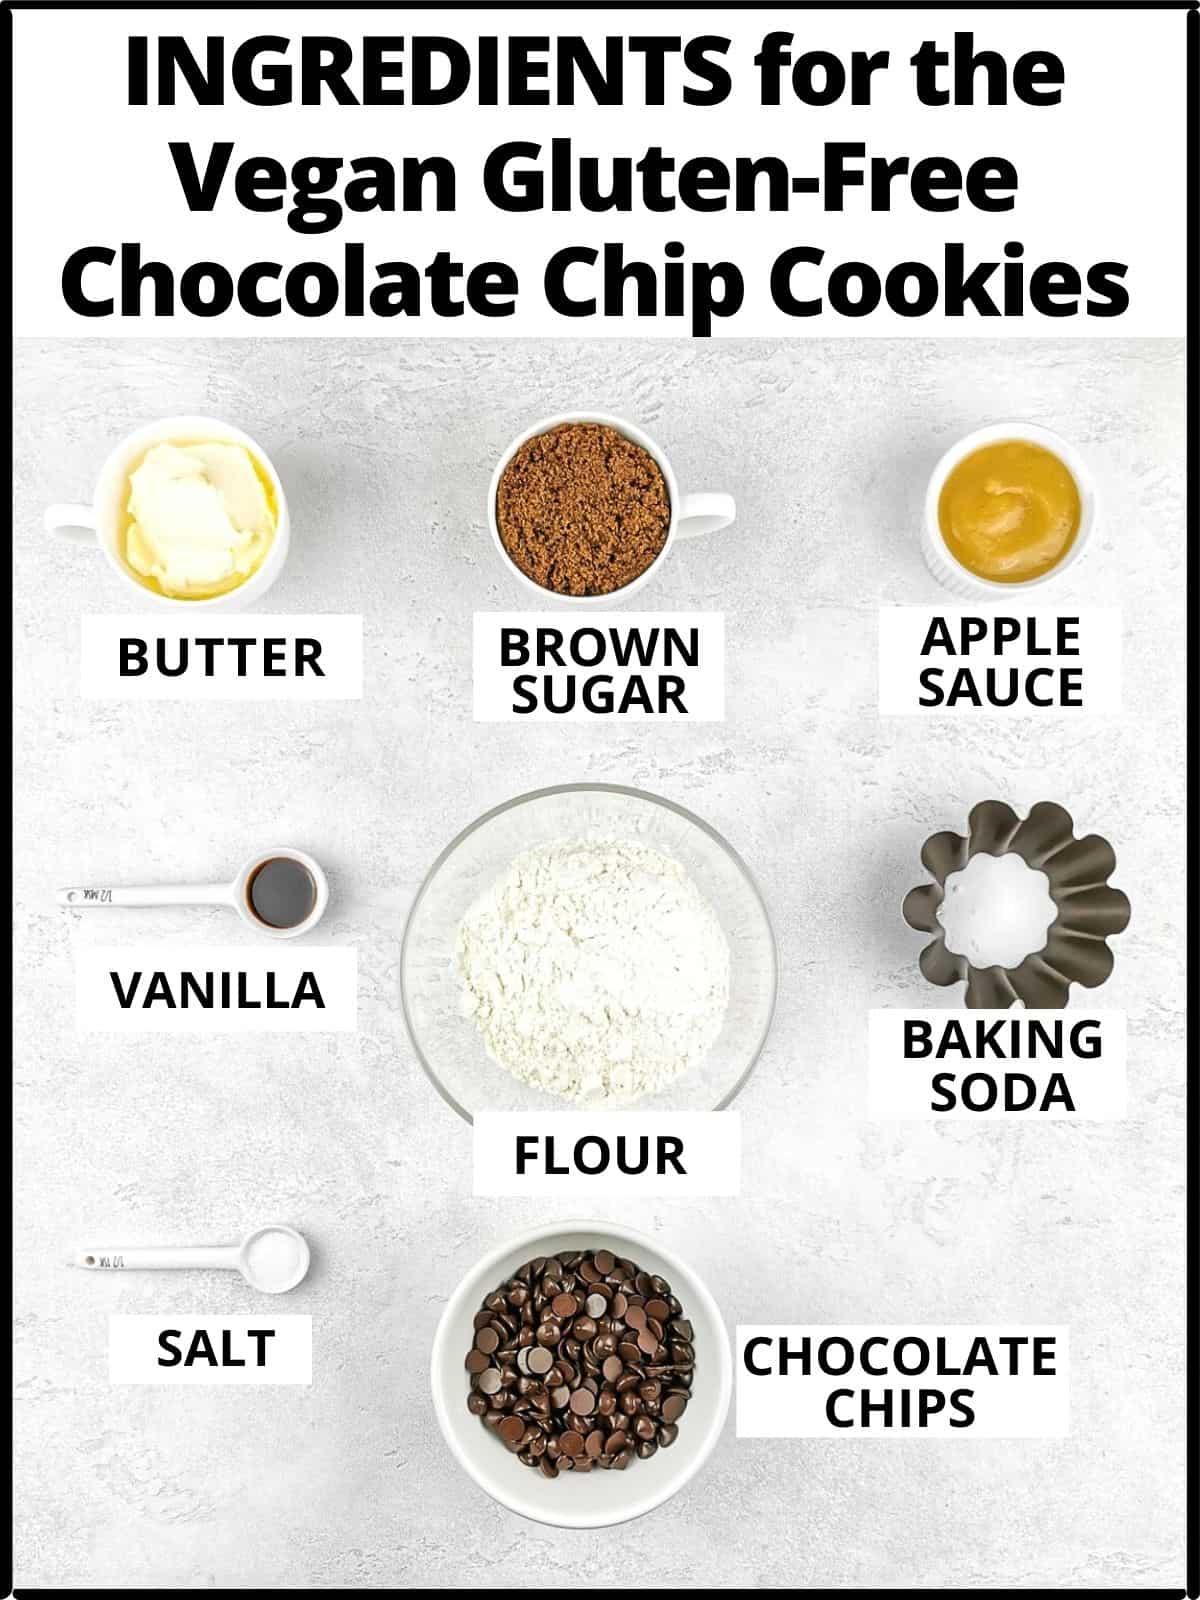 Ingredients for the cookies: butter, sugar, apple sauce, vanilla, flour, baking powder, salt, chocolate chips